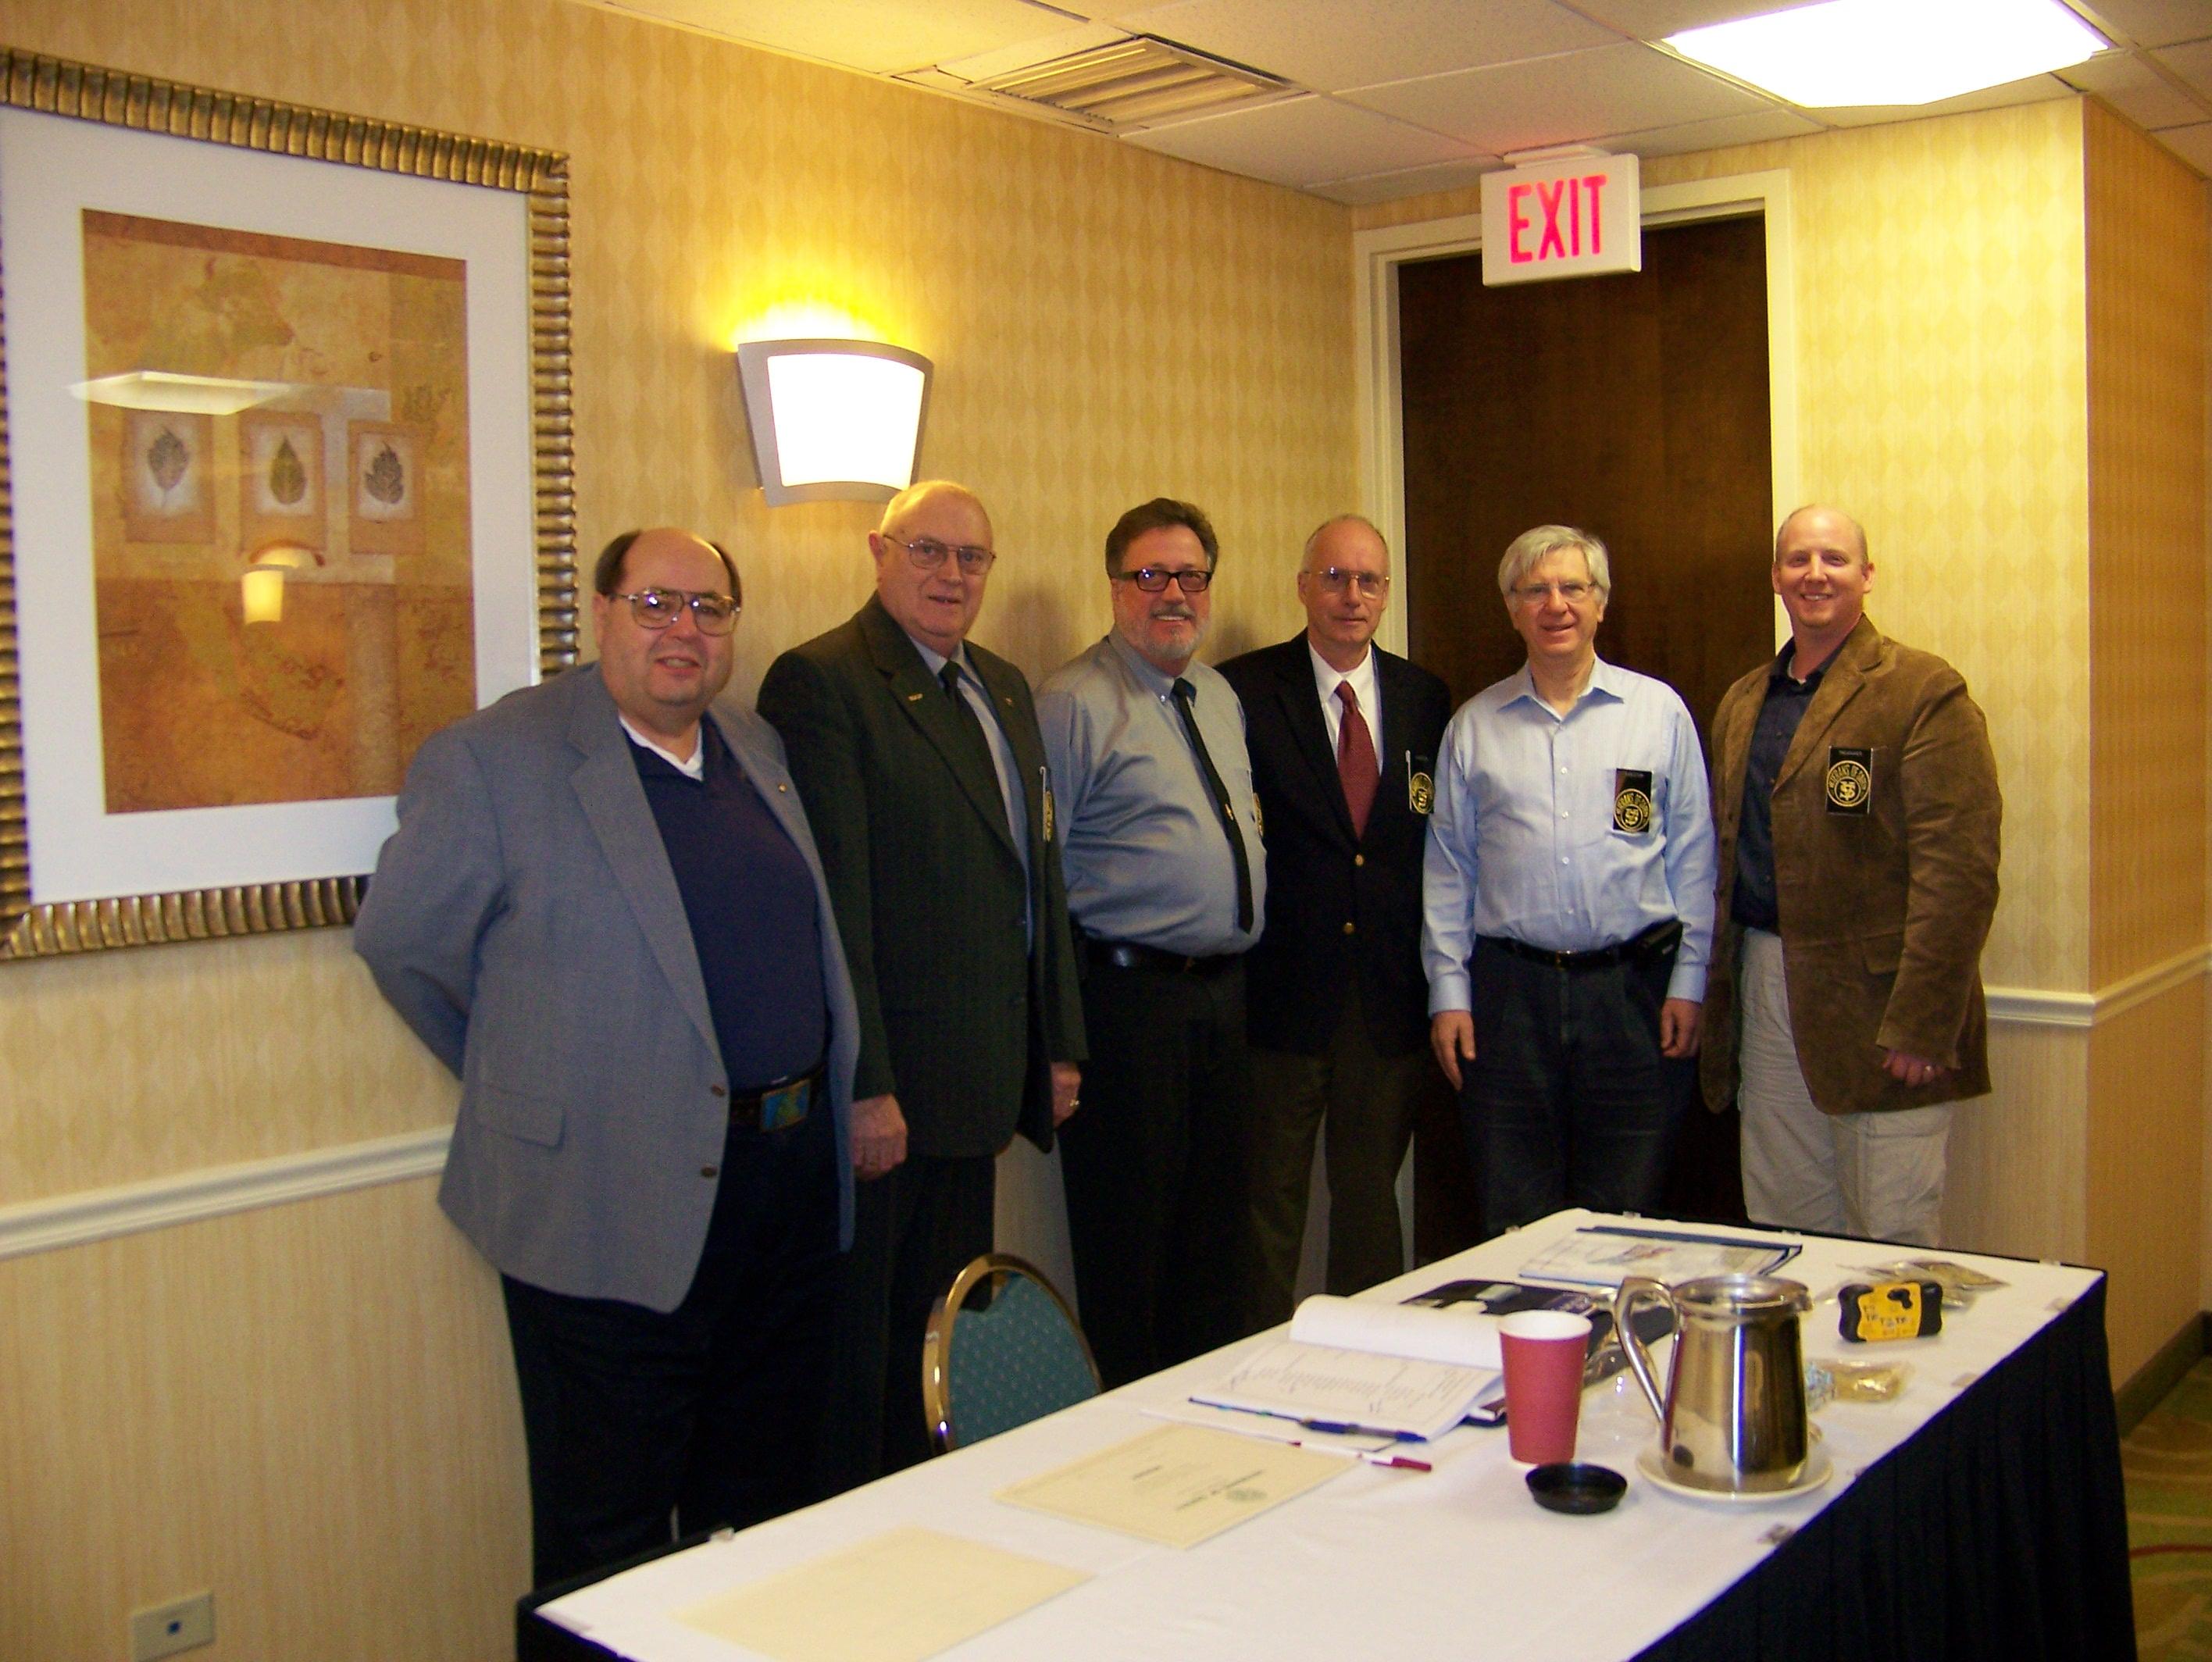 February 2009 Board of Directors Meeting